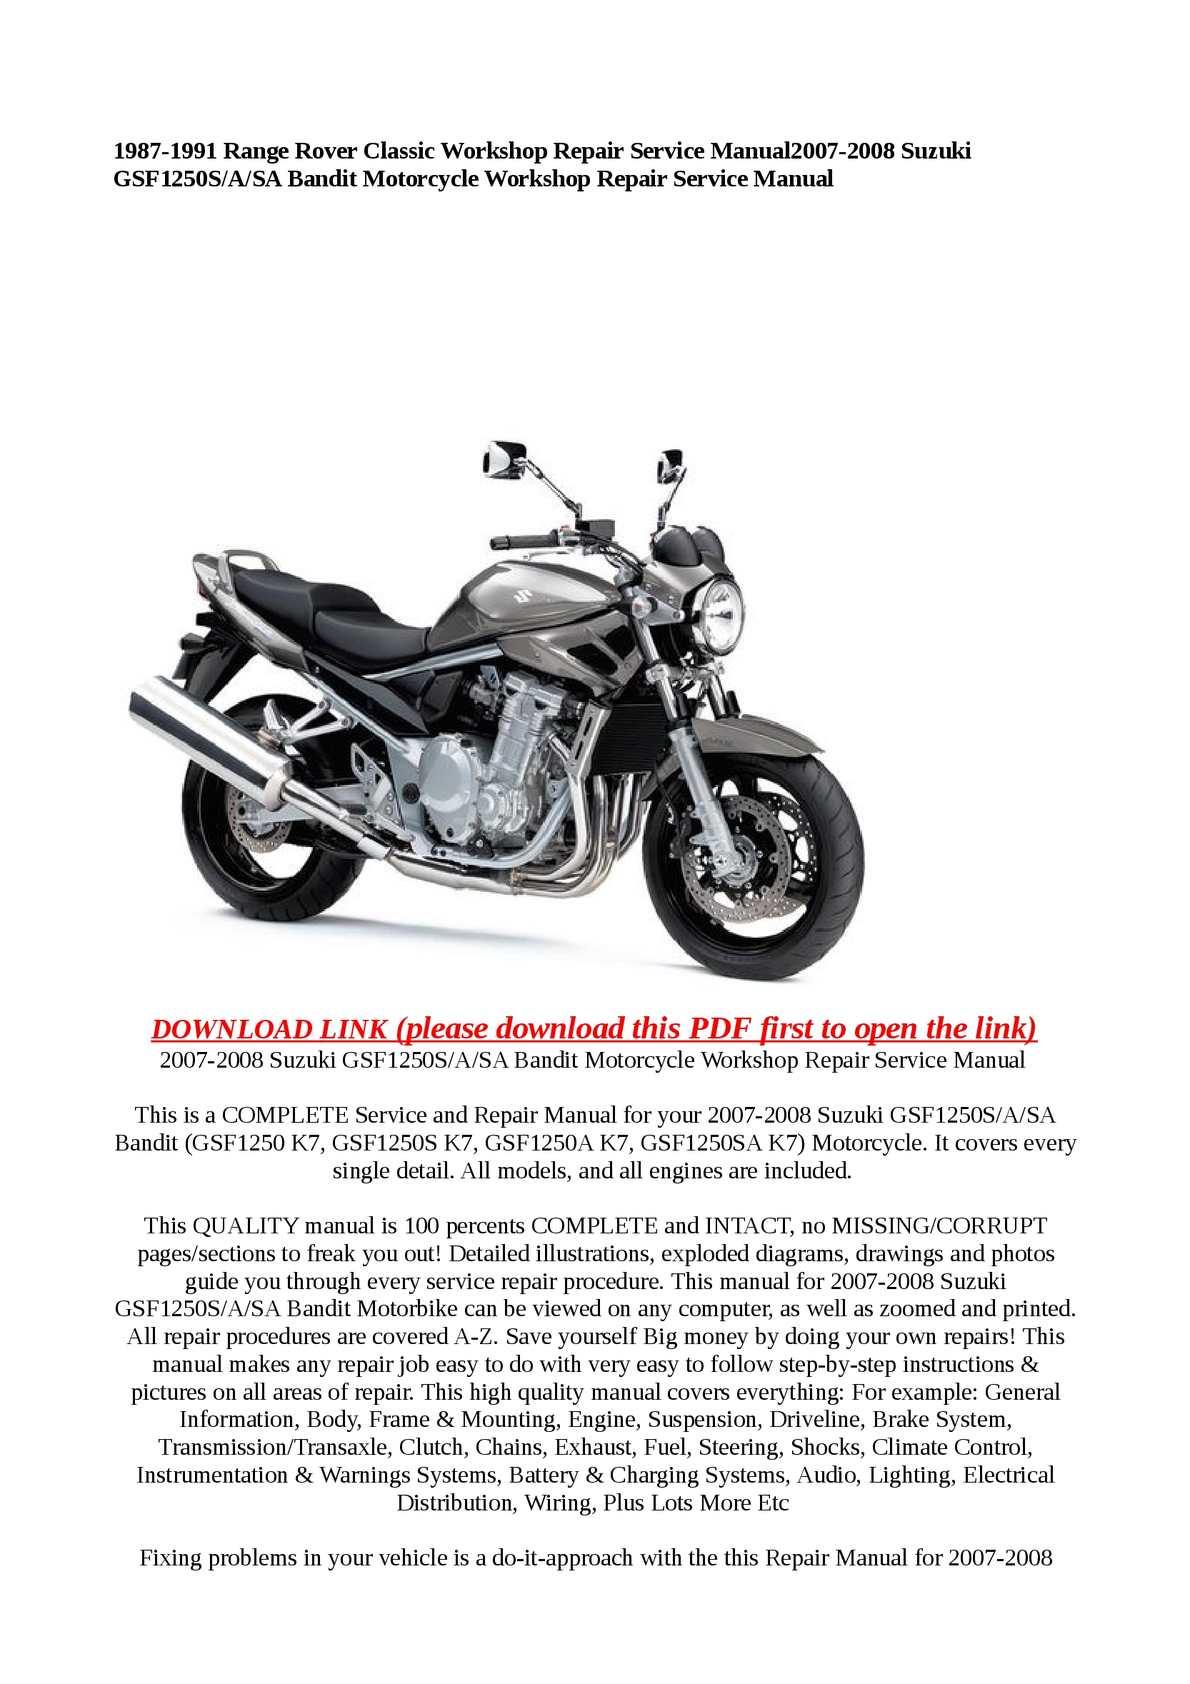 calam o www tradebit com visit php 424362 product 222087030 rh calameo com Suzuki RM 125 Repair Manual Suzuki Auto Repair Manuals